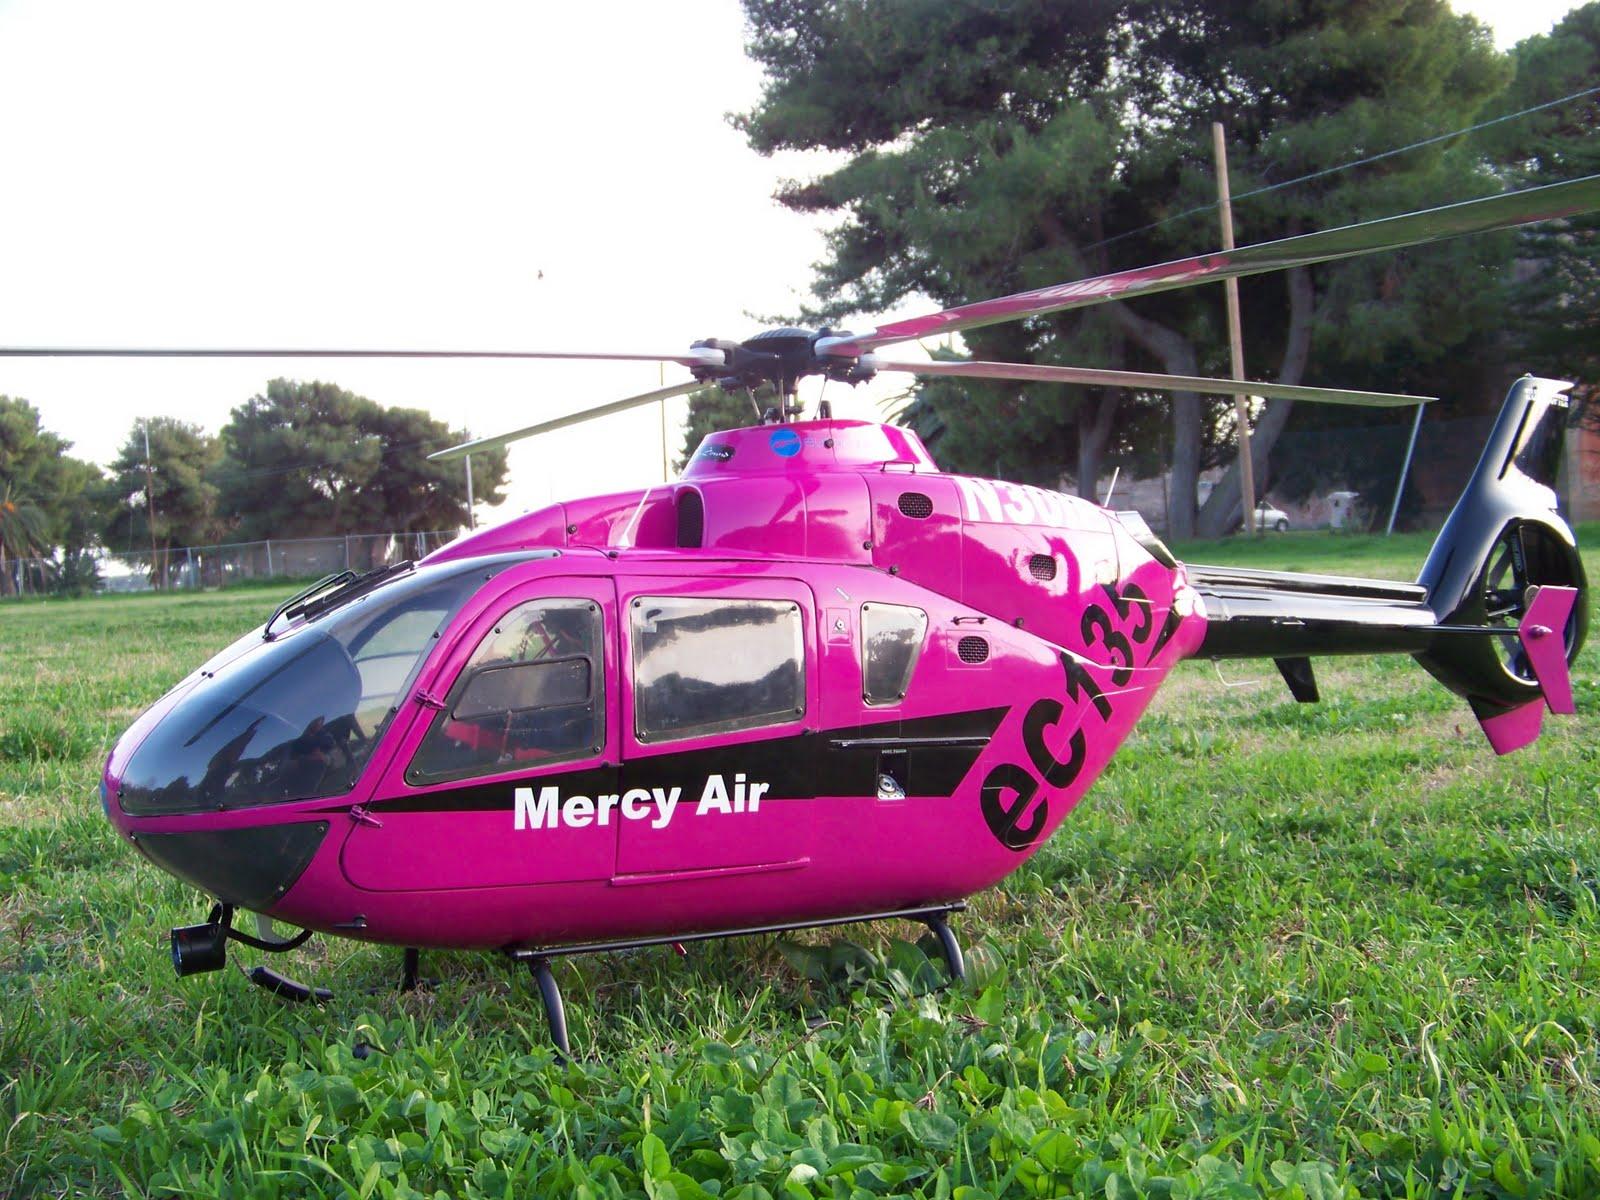 Elicottero 007 : Orbetellove: manuel tellini: modelli positivi..